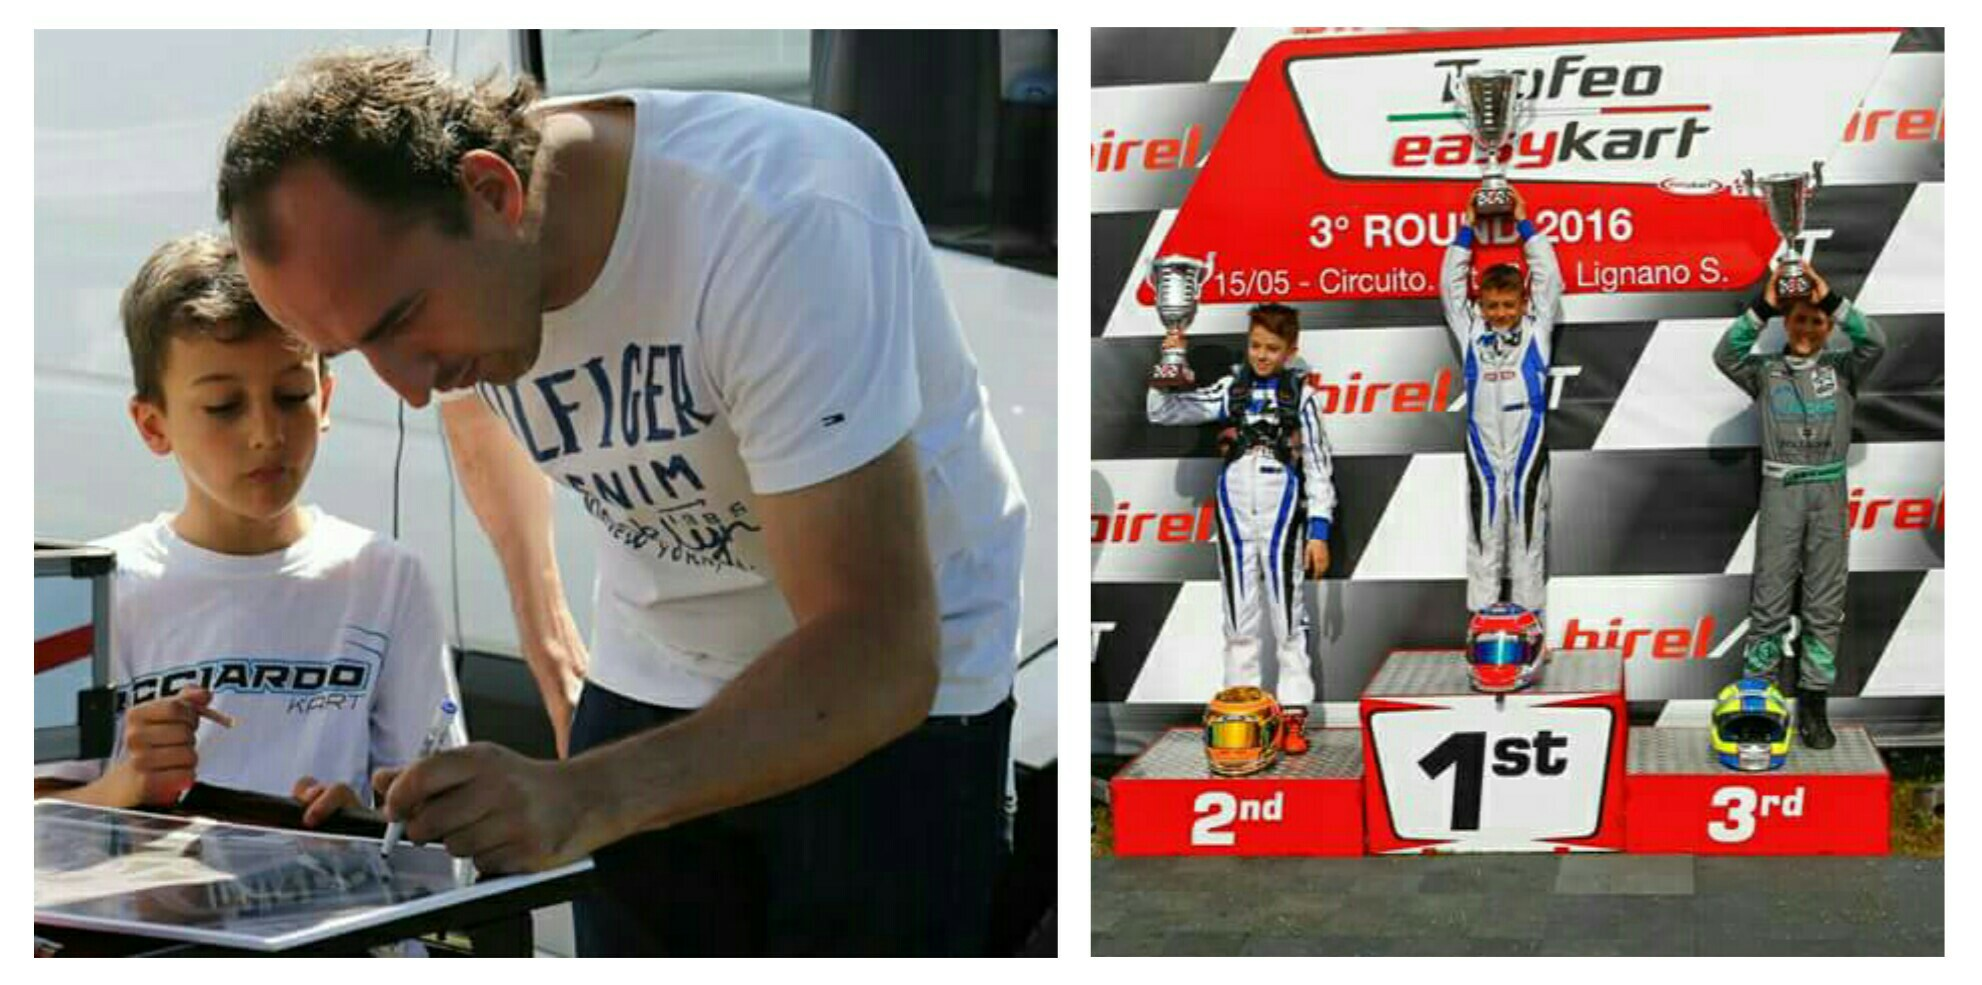 Robert Kubica & Cristian Bertuca - Rok Cup & Trofeo Easy Kart -Lignano Sabbiadoro 2016